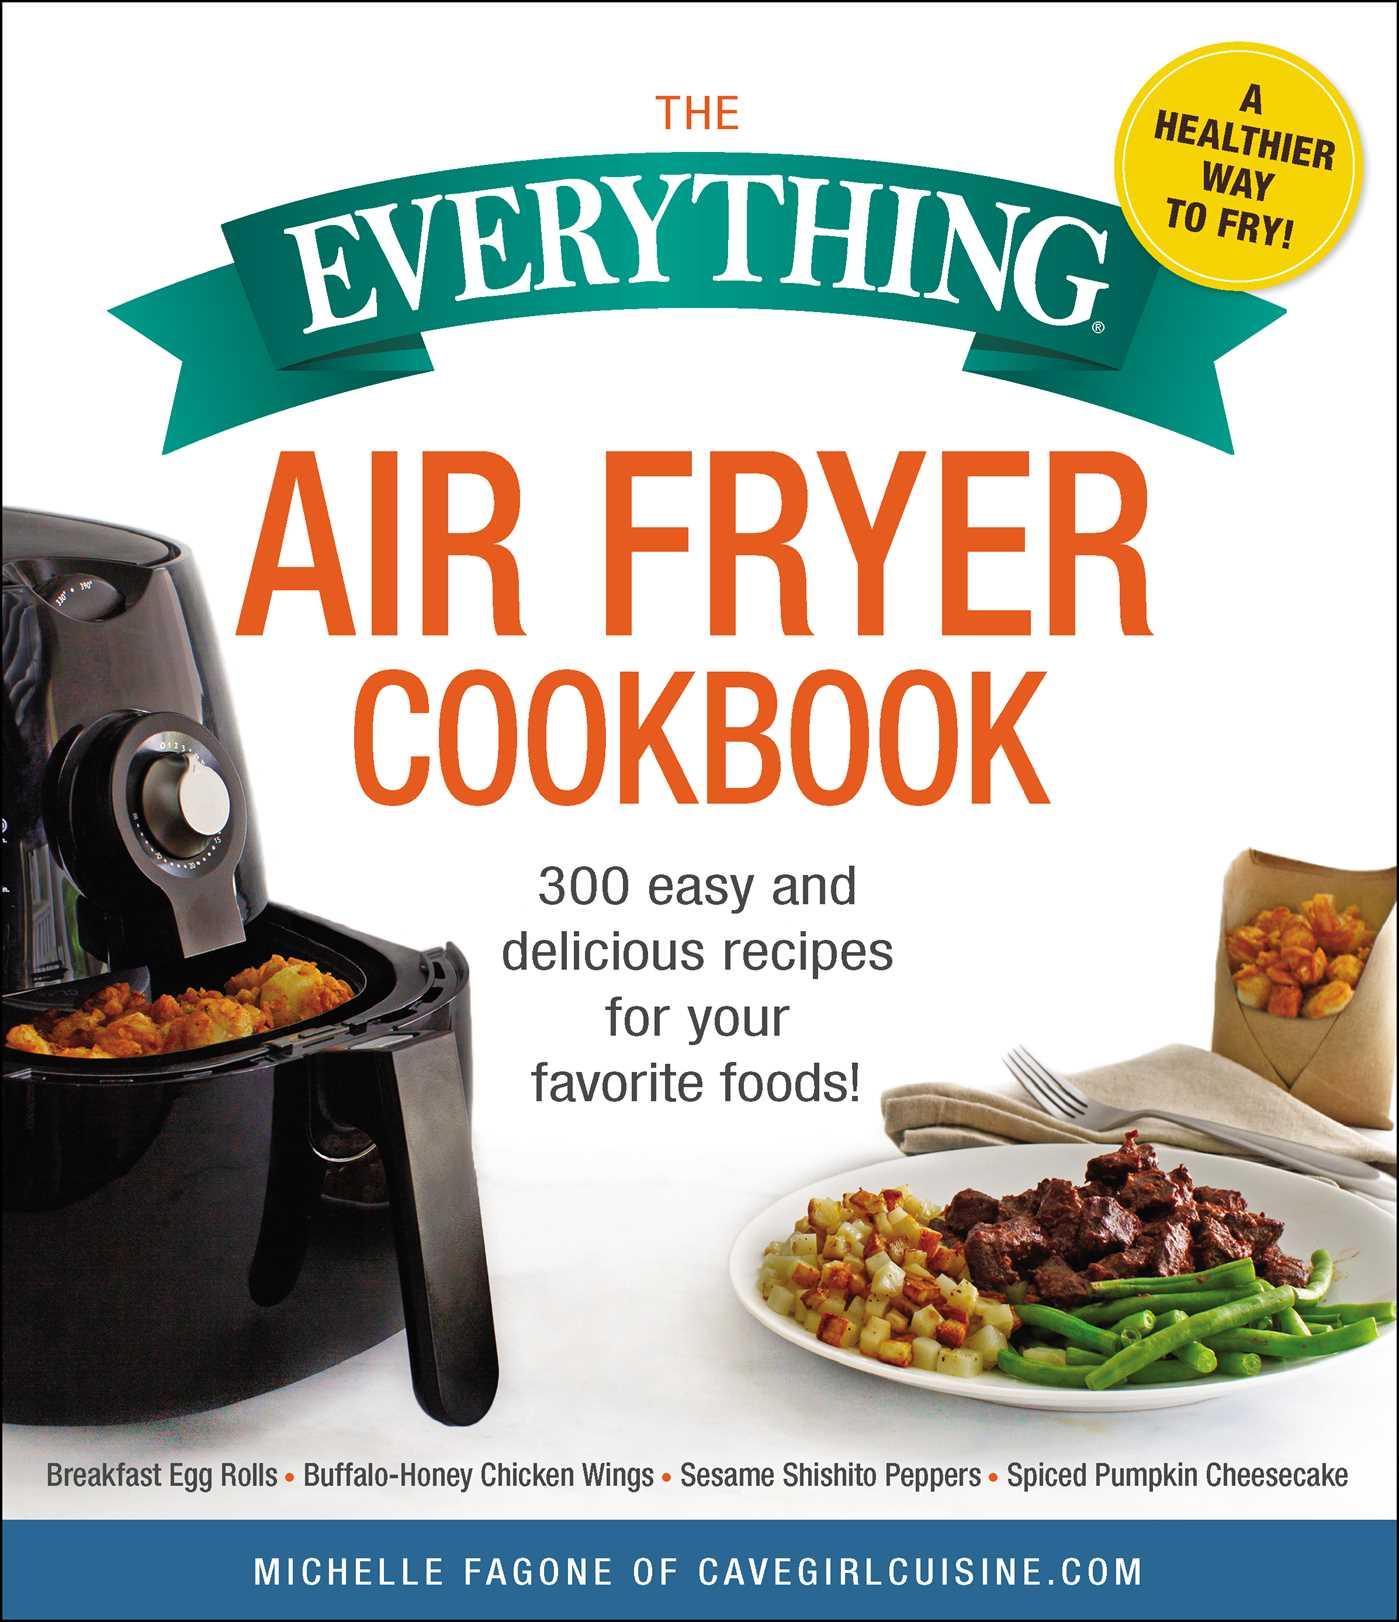 The everything air fryer cookbook 9781507209127 hr